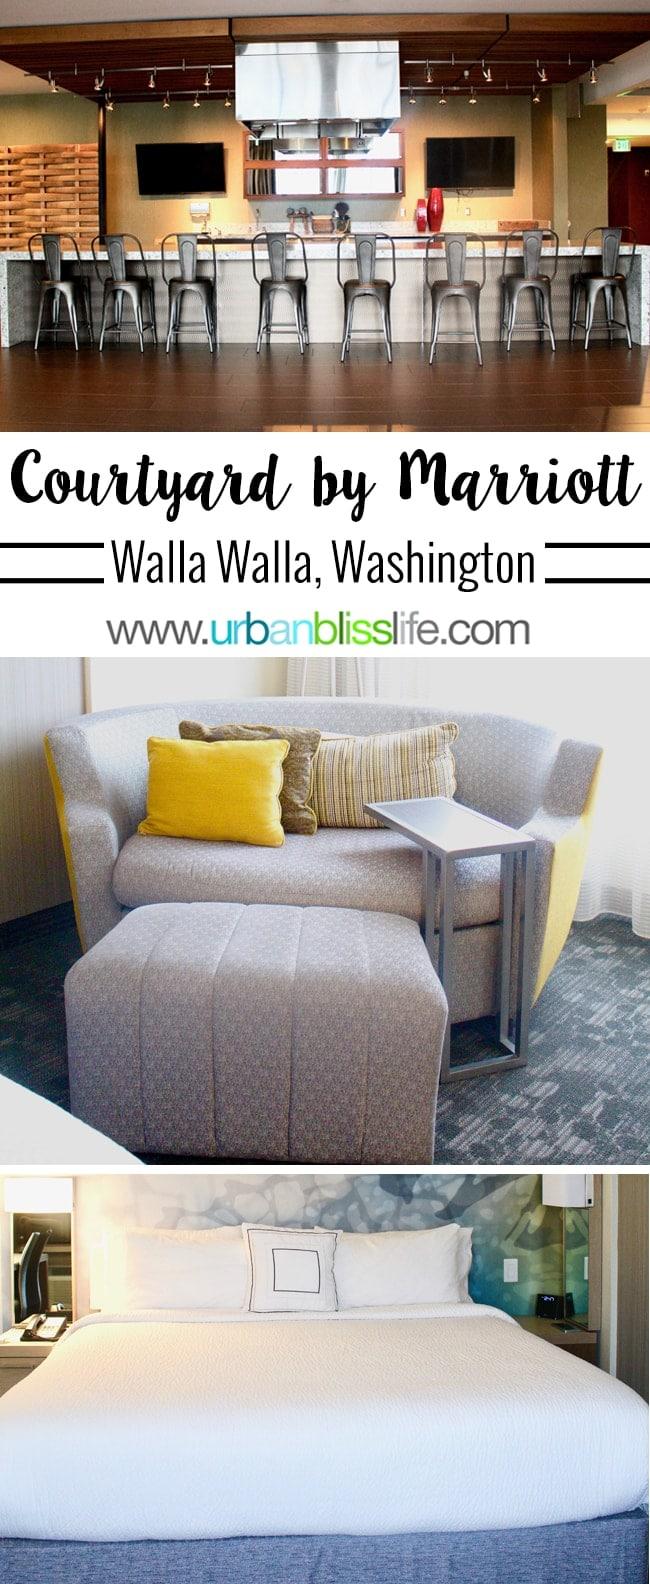 Walla Walla Courtyard Marriott Washington wine country hotel review on UrbanBlissLife.com